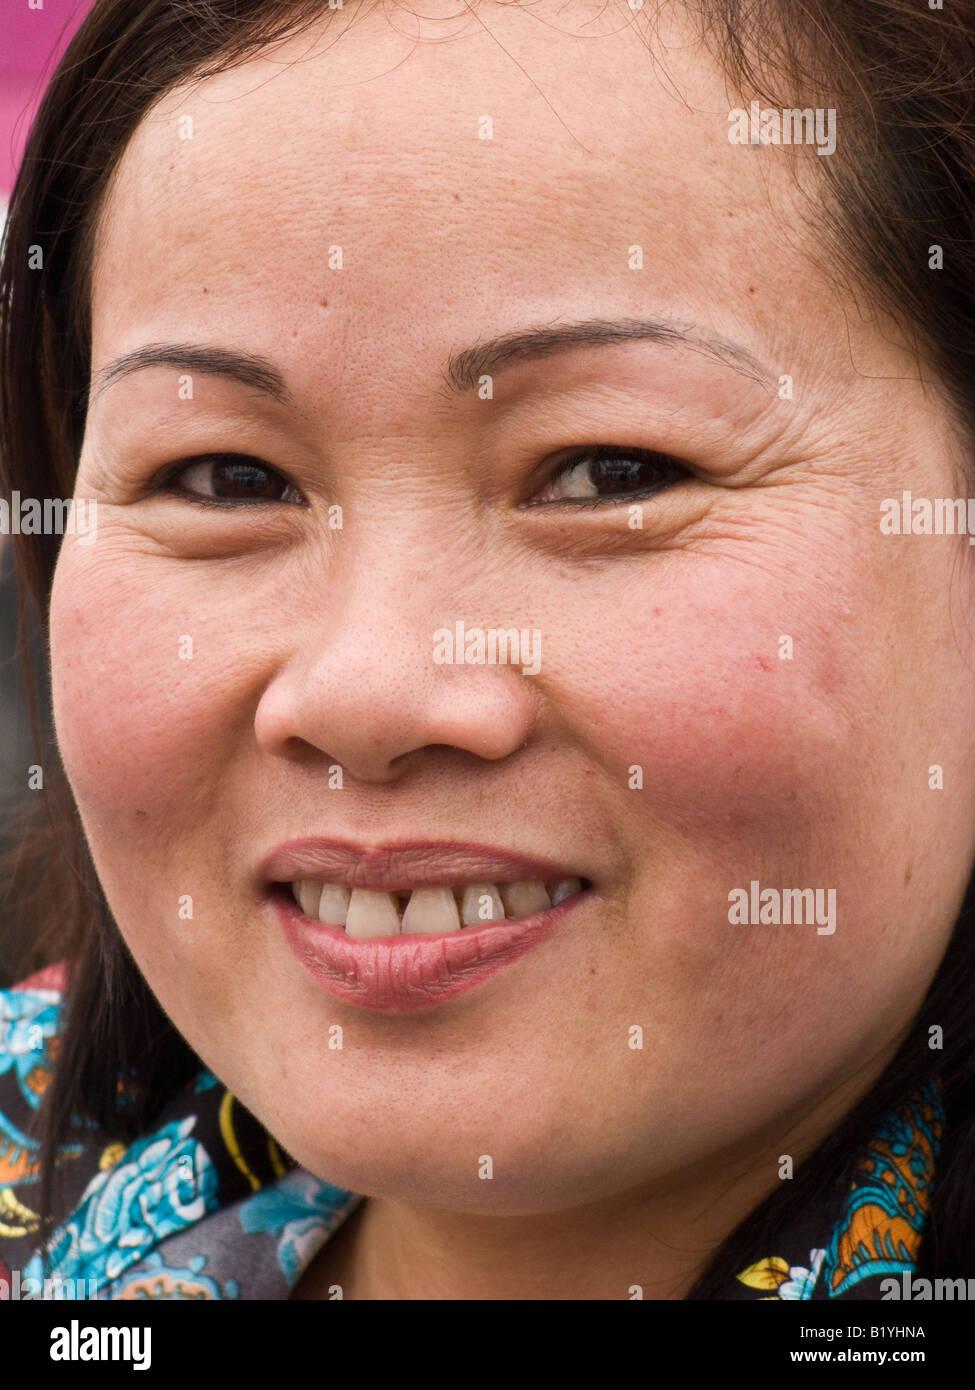 portrait of smiling Vietnamese woman, 40s - Stock Image